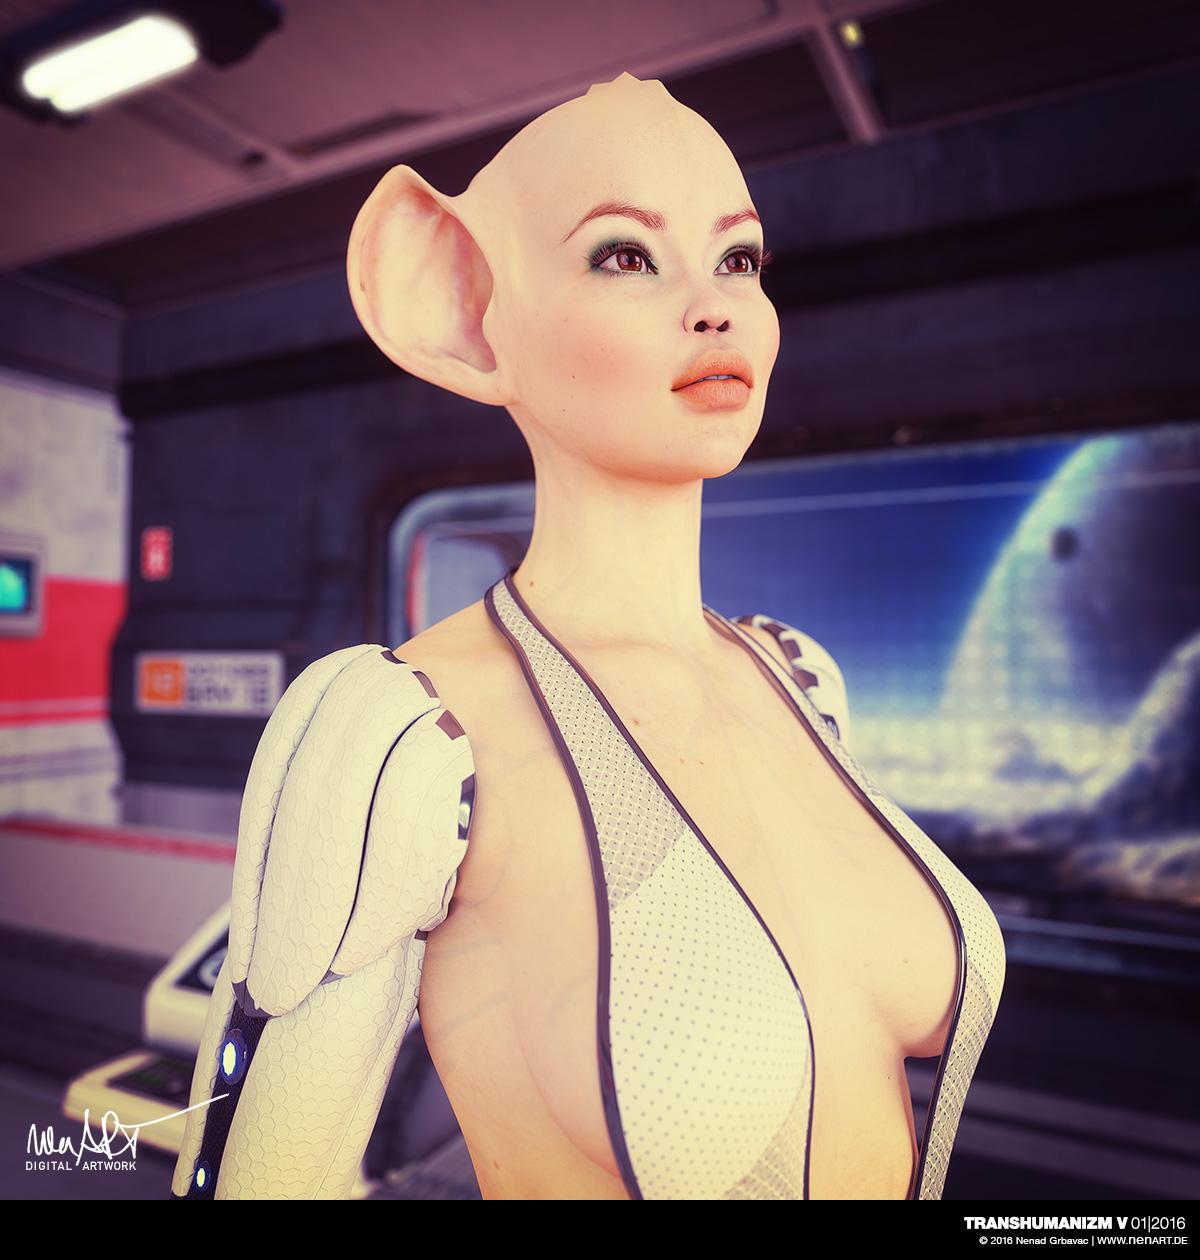 DA_-_Transhumanizm-V_1200x1200